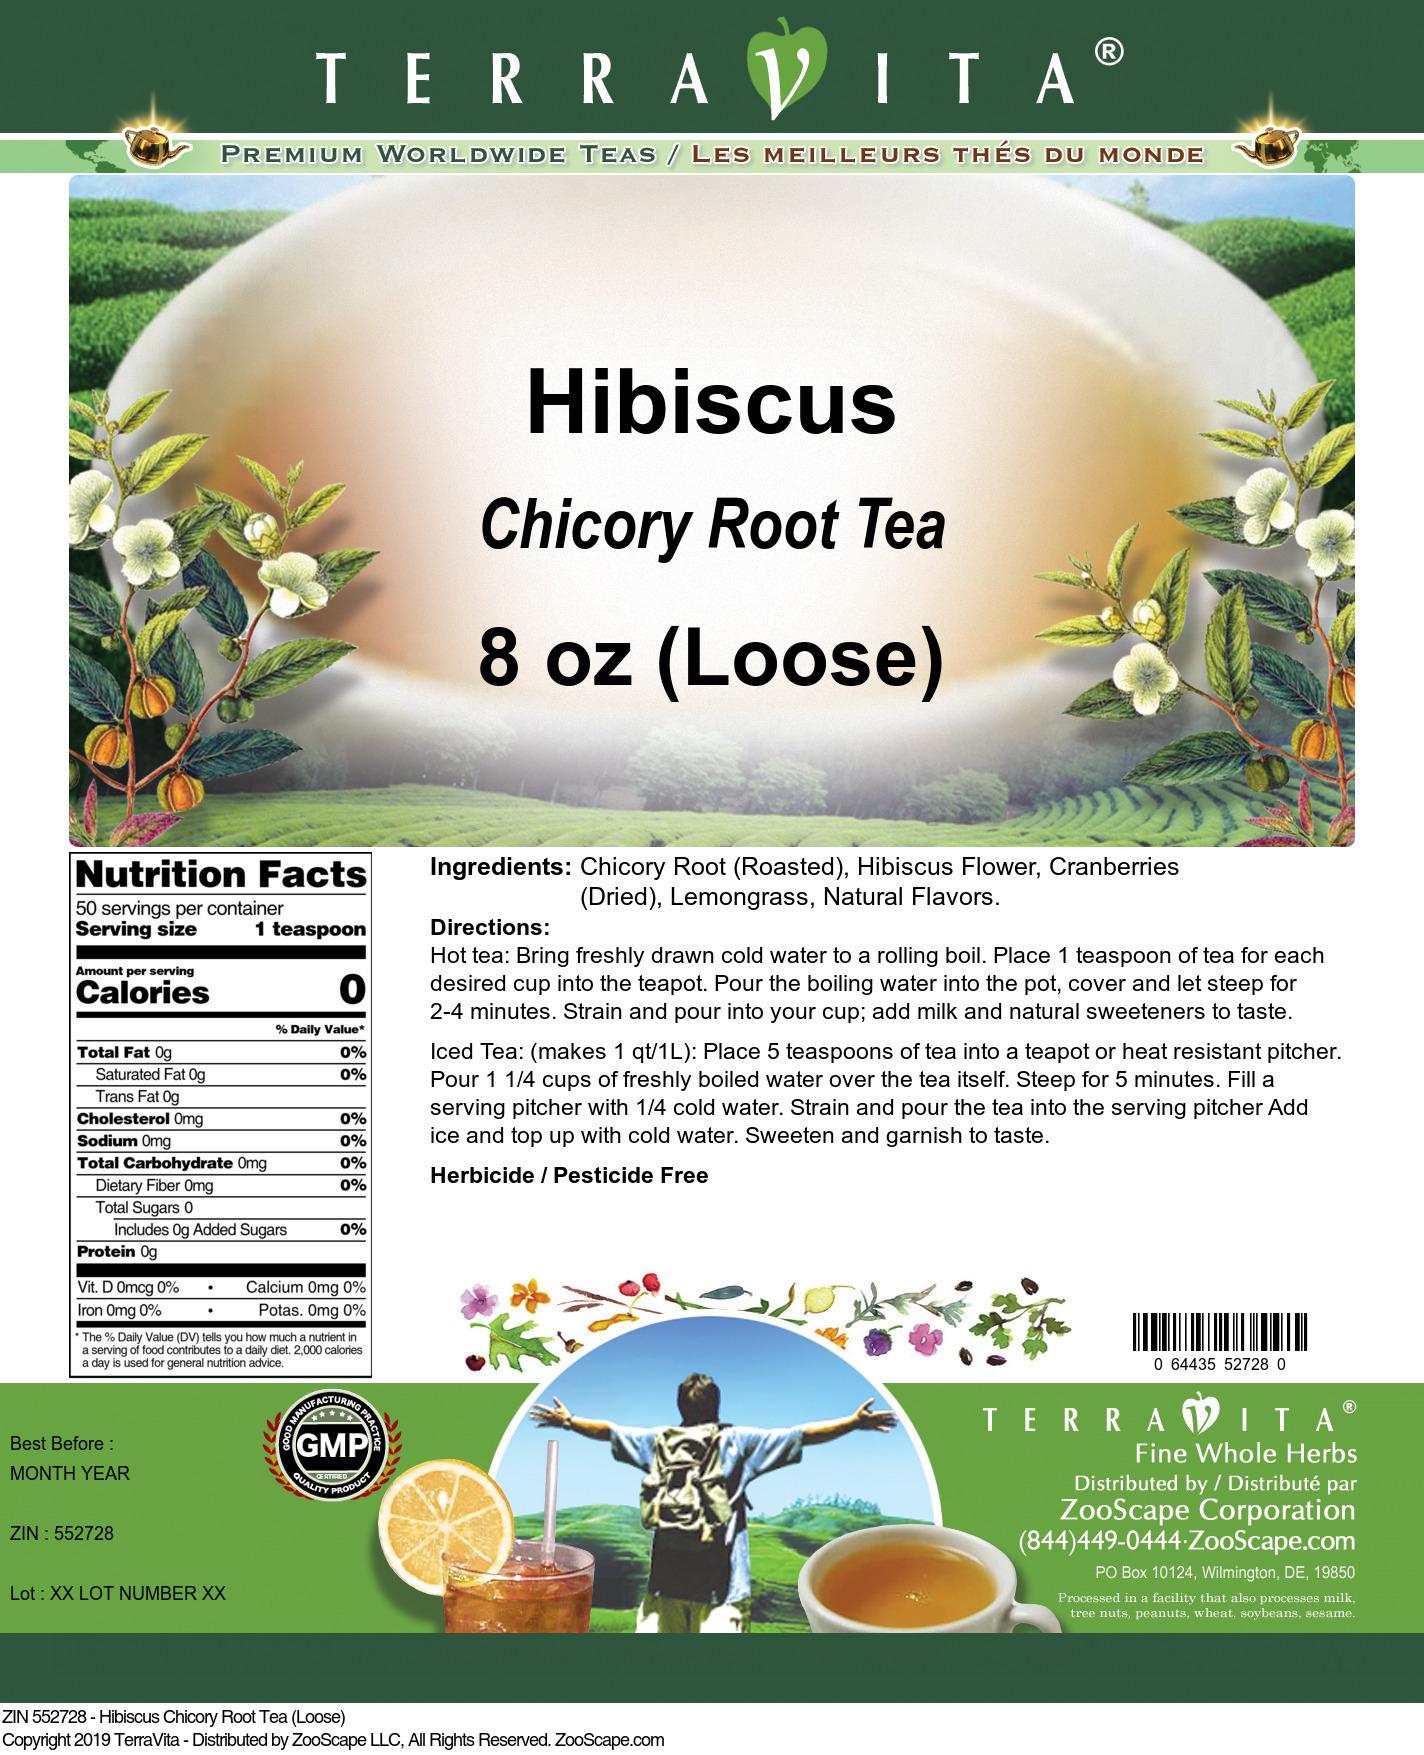 Hibiscus Chicory Root Tea (Loose)